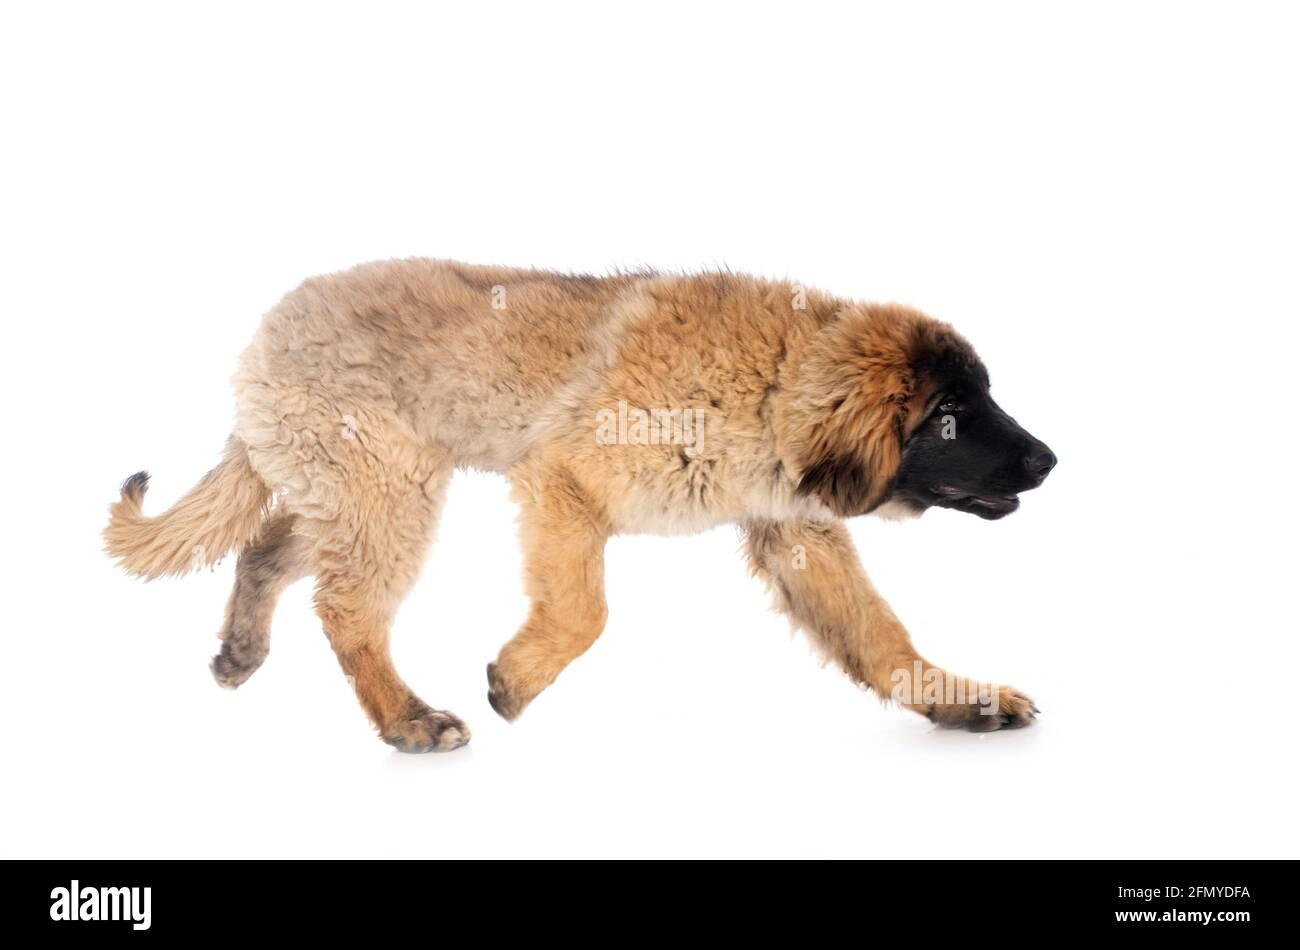 El cachorro Leonberger frente al fondo blanco Foto de stock